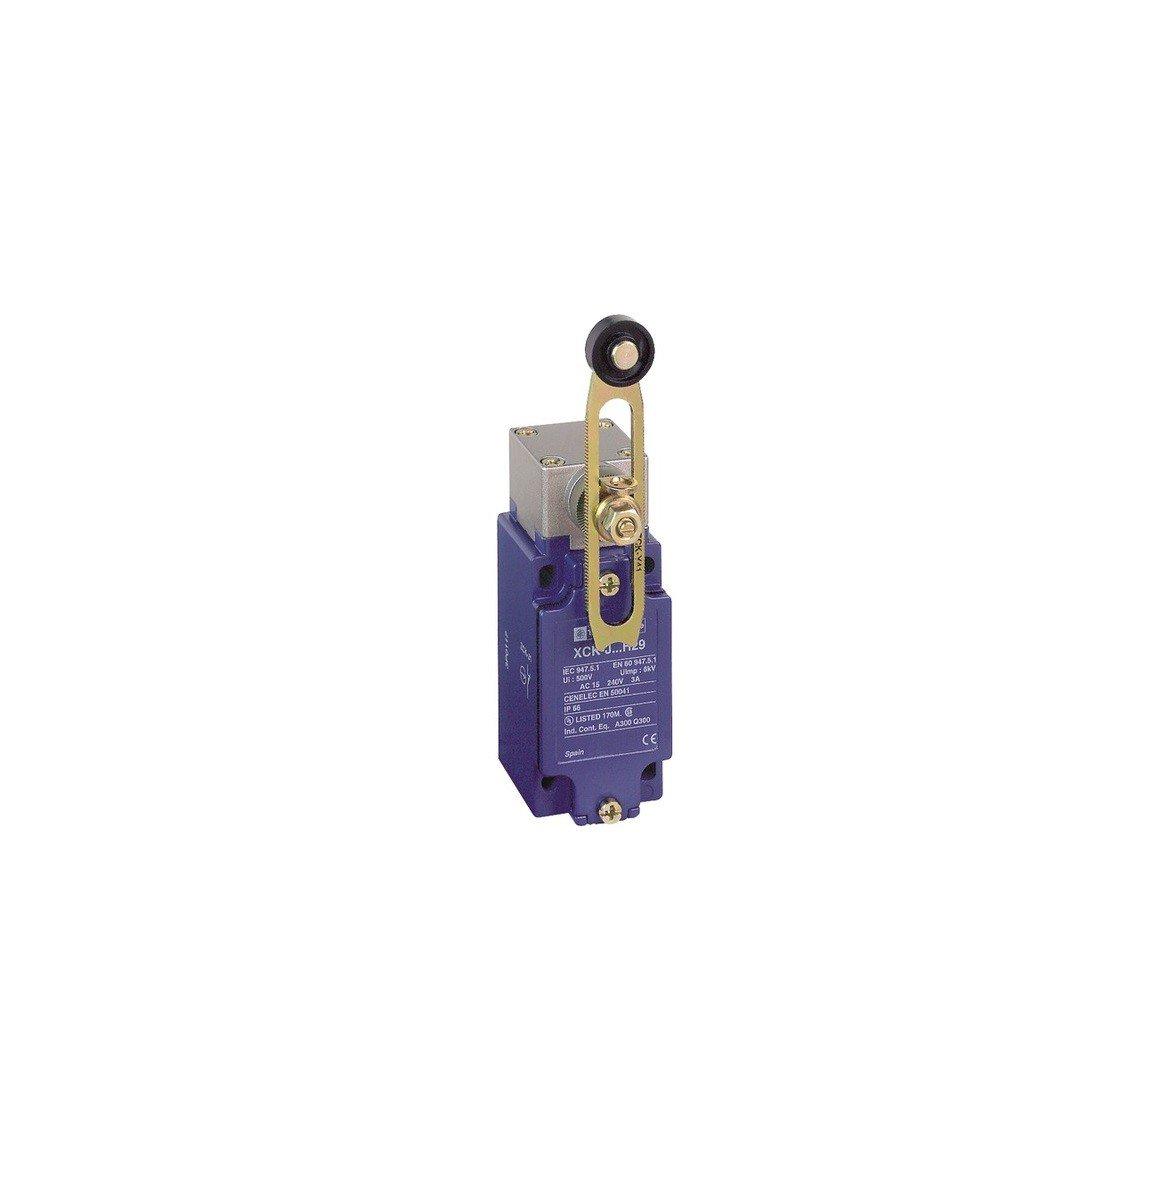 Schneider Electric XCKJ10541H29 ex OsiSwitch Métal Interrupteur de position format standard, levier à galet thermoplastique long, tête rotative, 1NC+1NO, brusque, M20 levier à galet thermoplastique long tête rotative